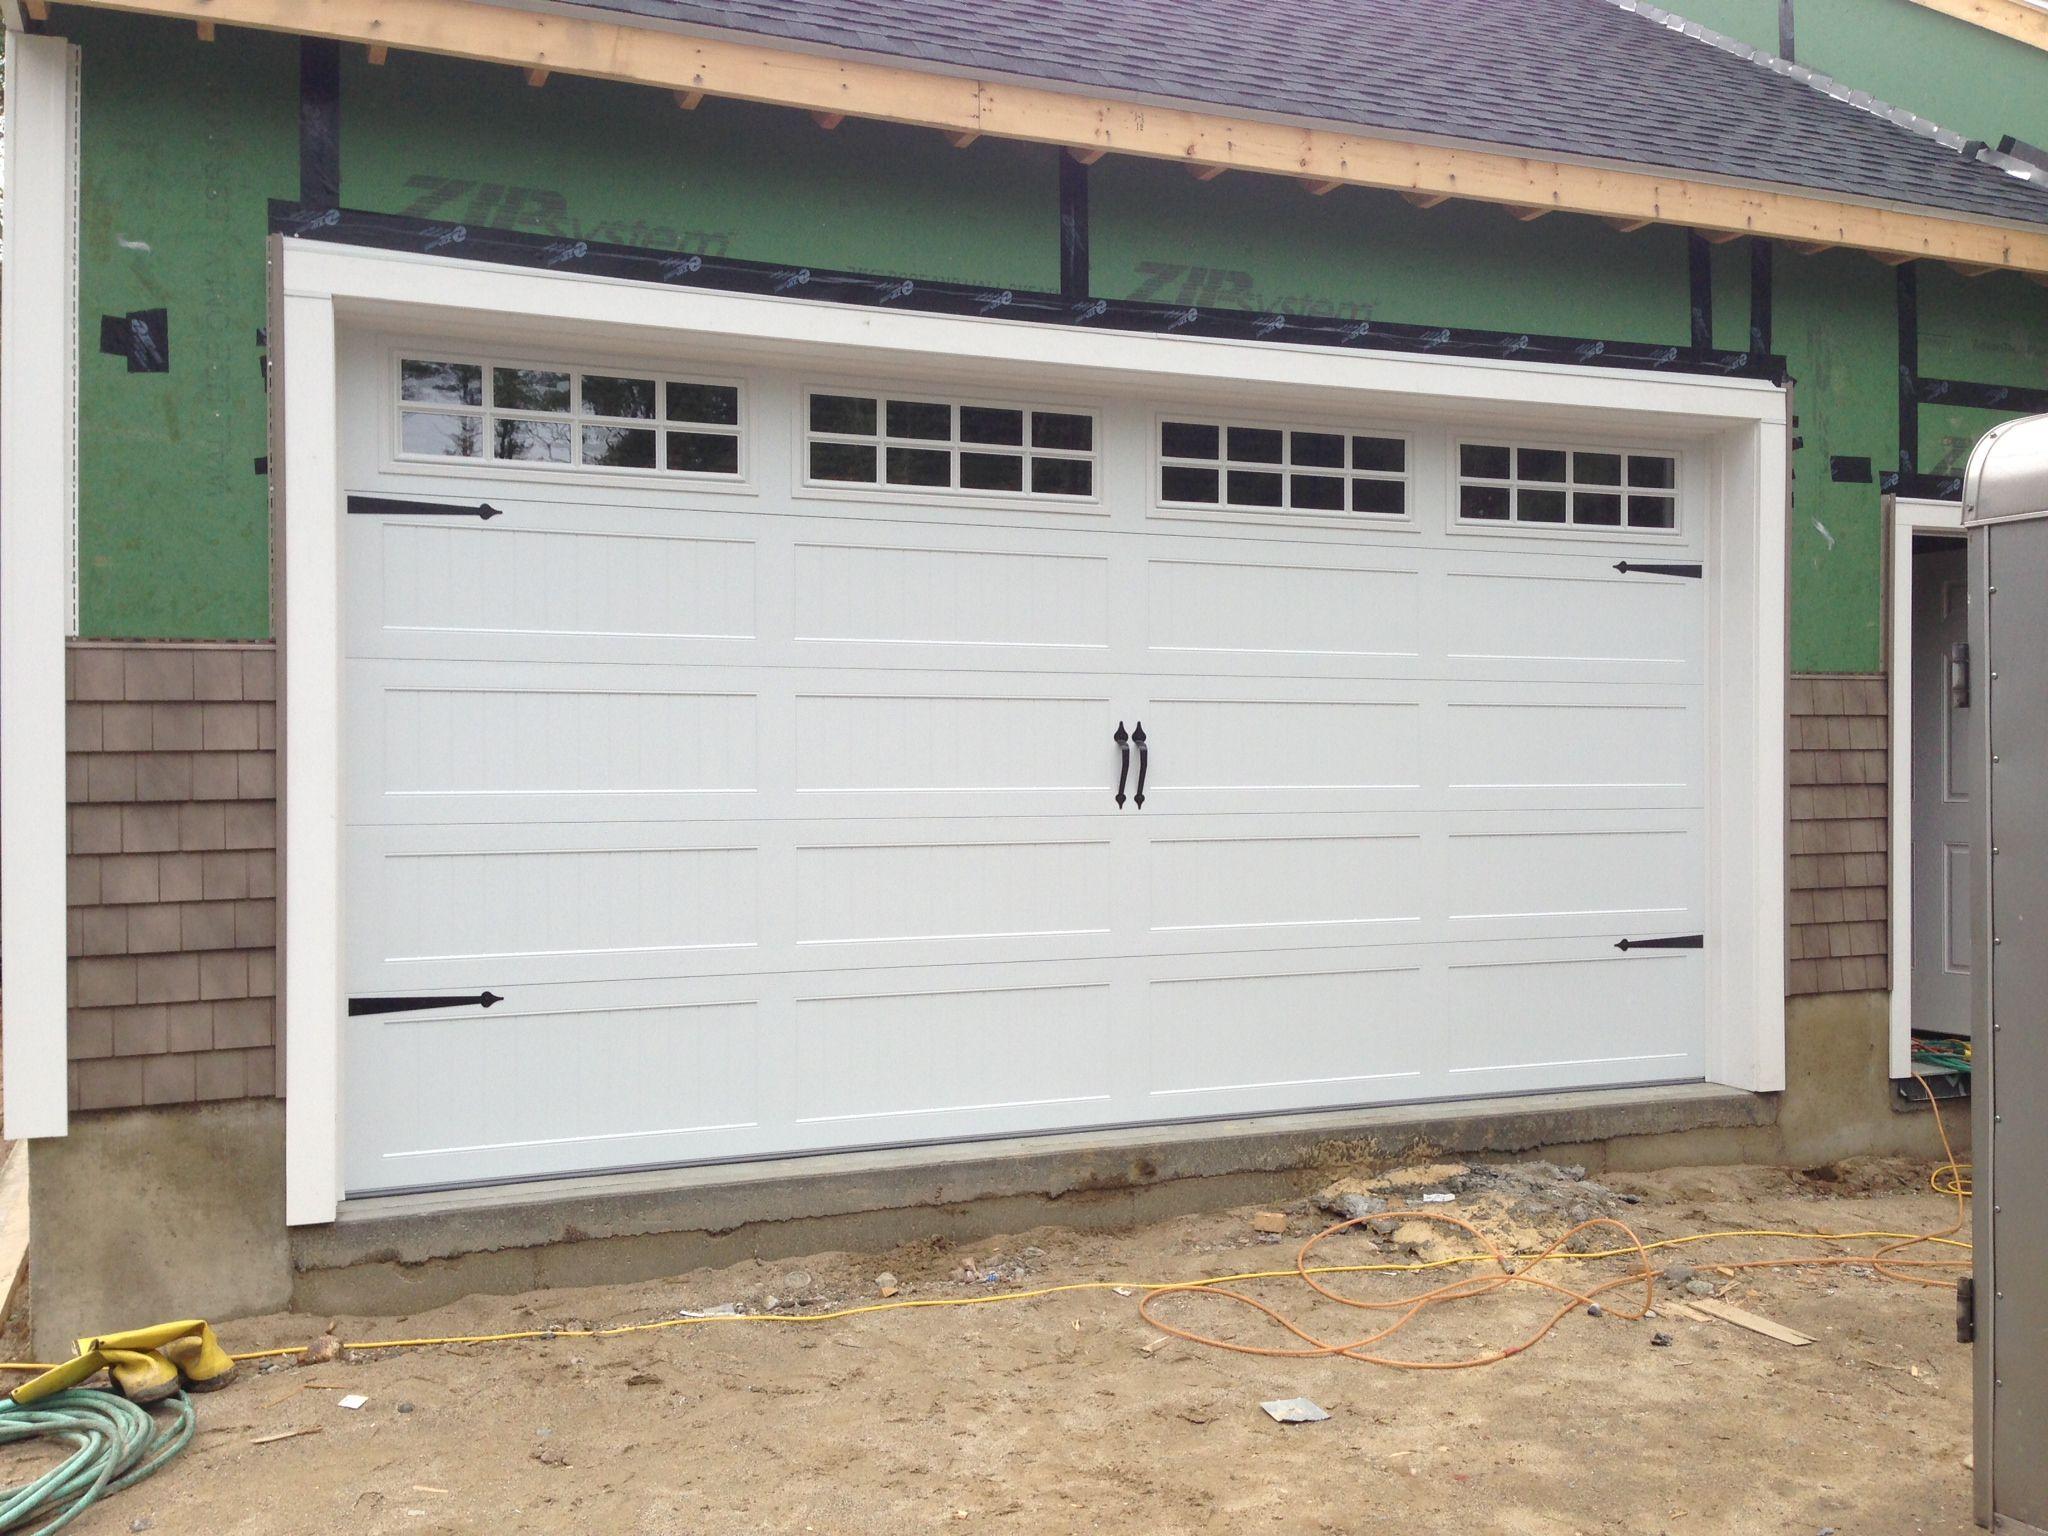 C H I Overhead Doors Model 5916 Long Panel Steel Carriage House